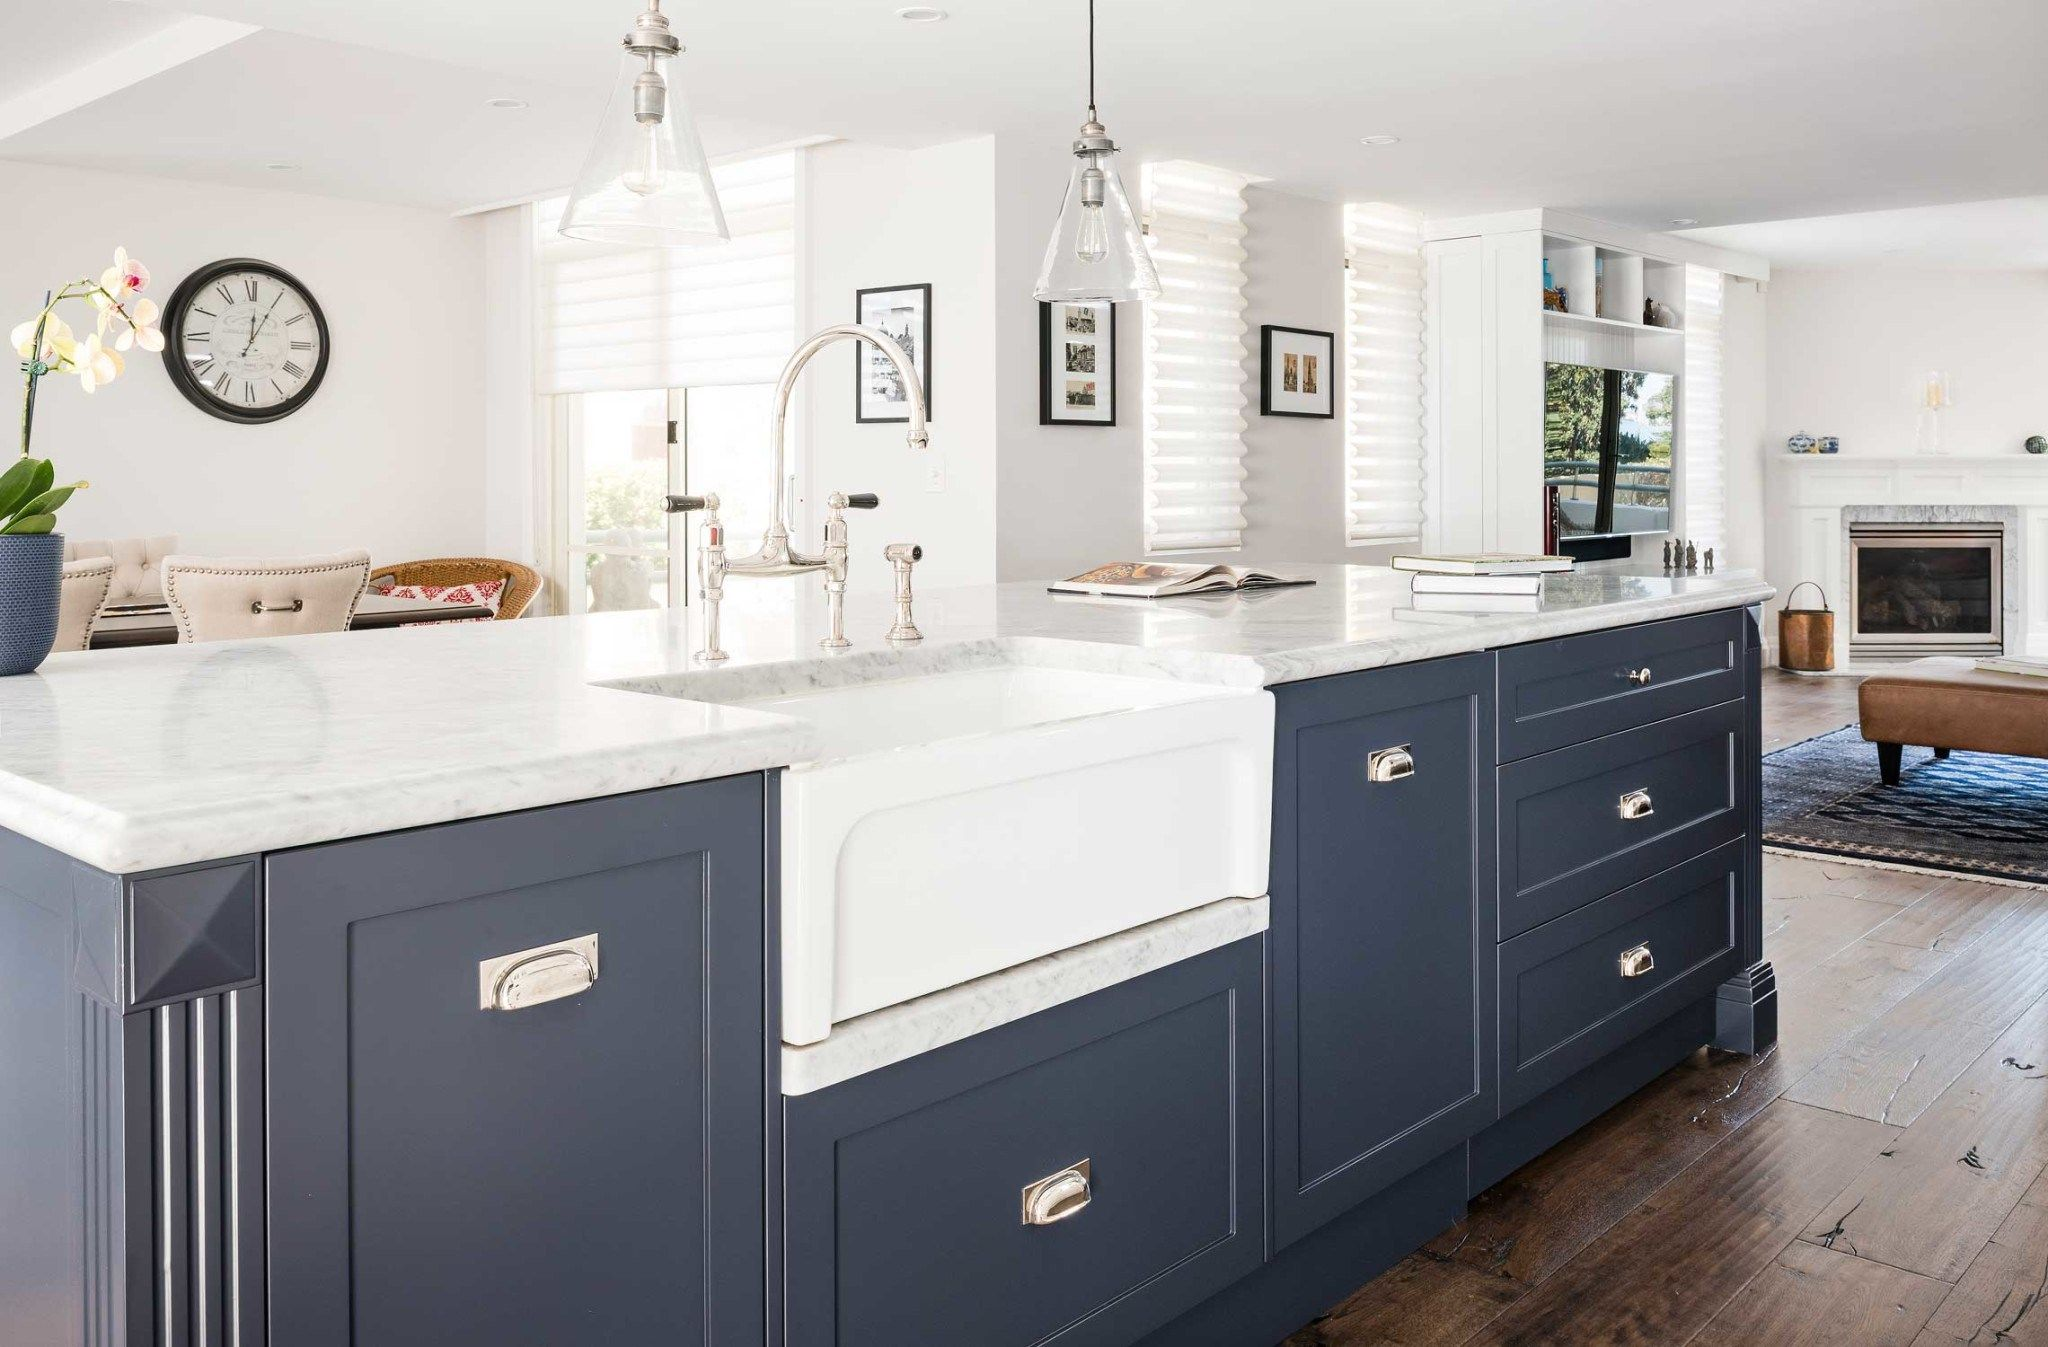 complete kitchen sinks guide rosemount kitchens melbourne